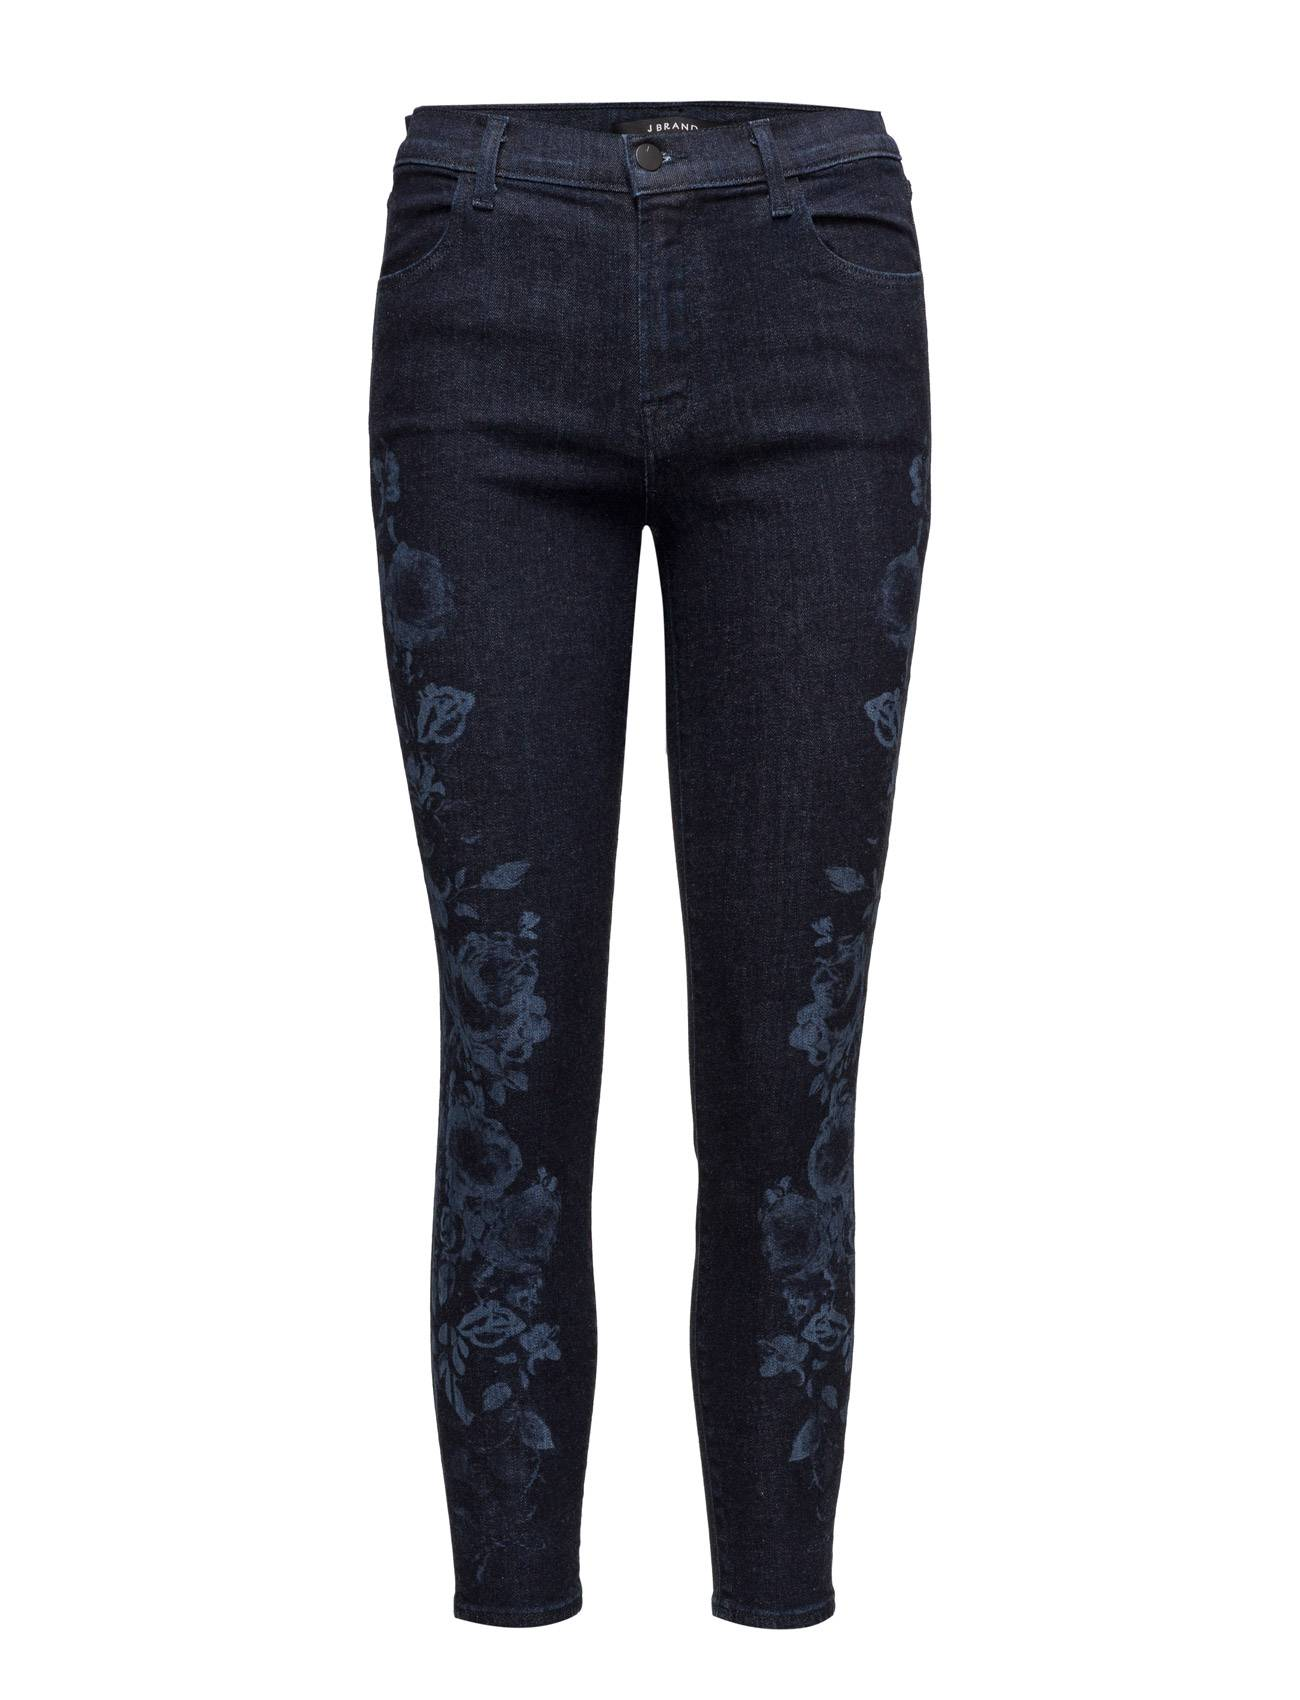 J brand T152 Alana High Rise Cropped Skinny